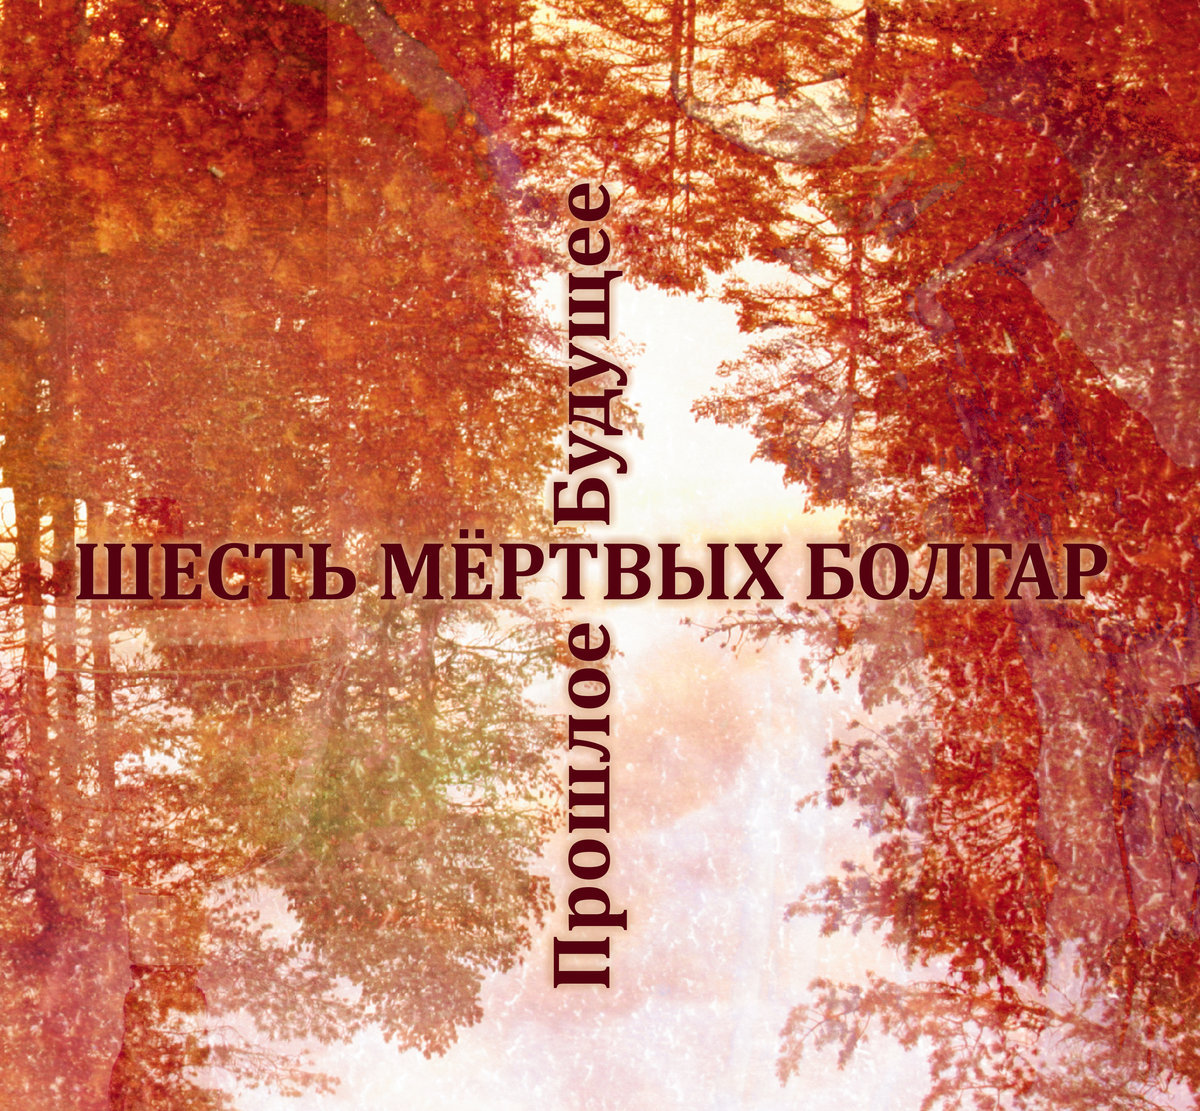 Six Dead Bulgarians - Future Bygone CD - 画像1